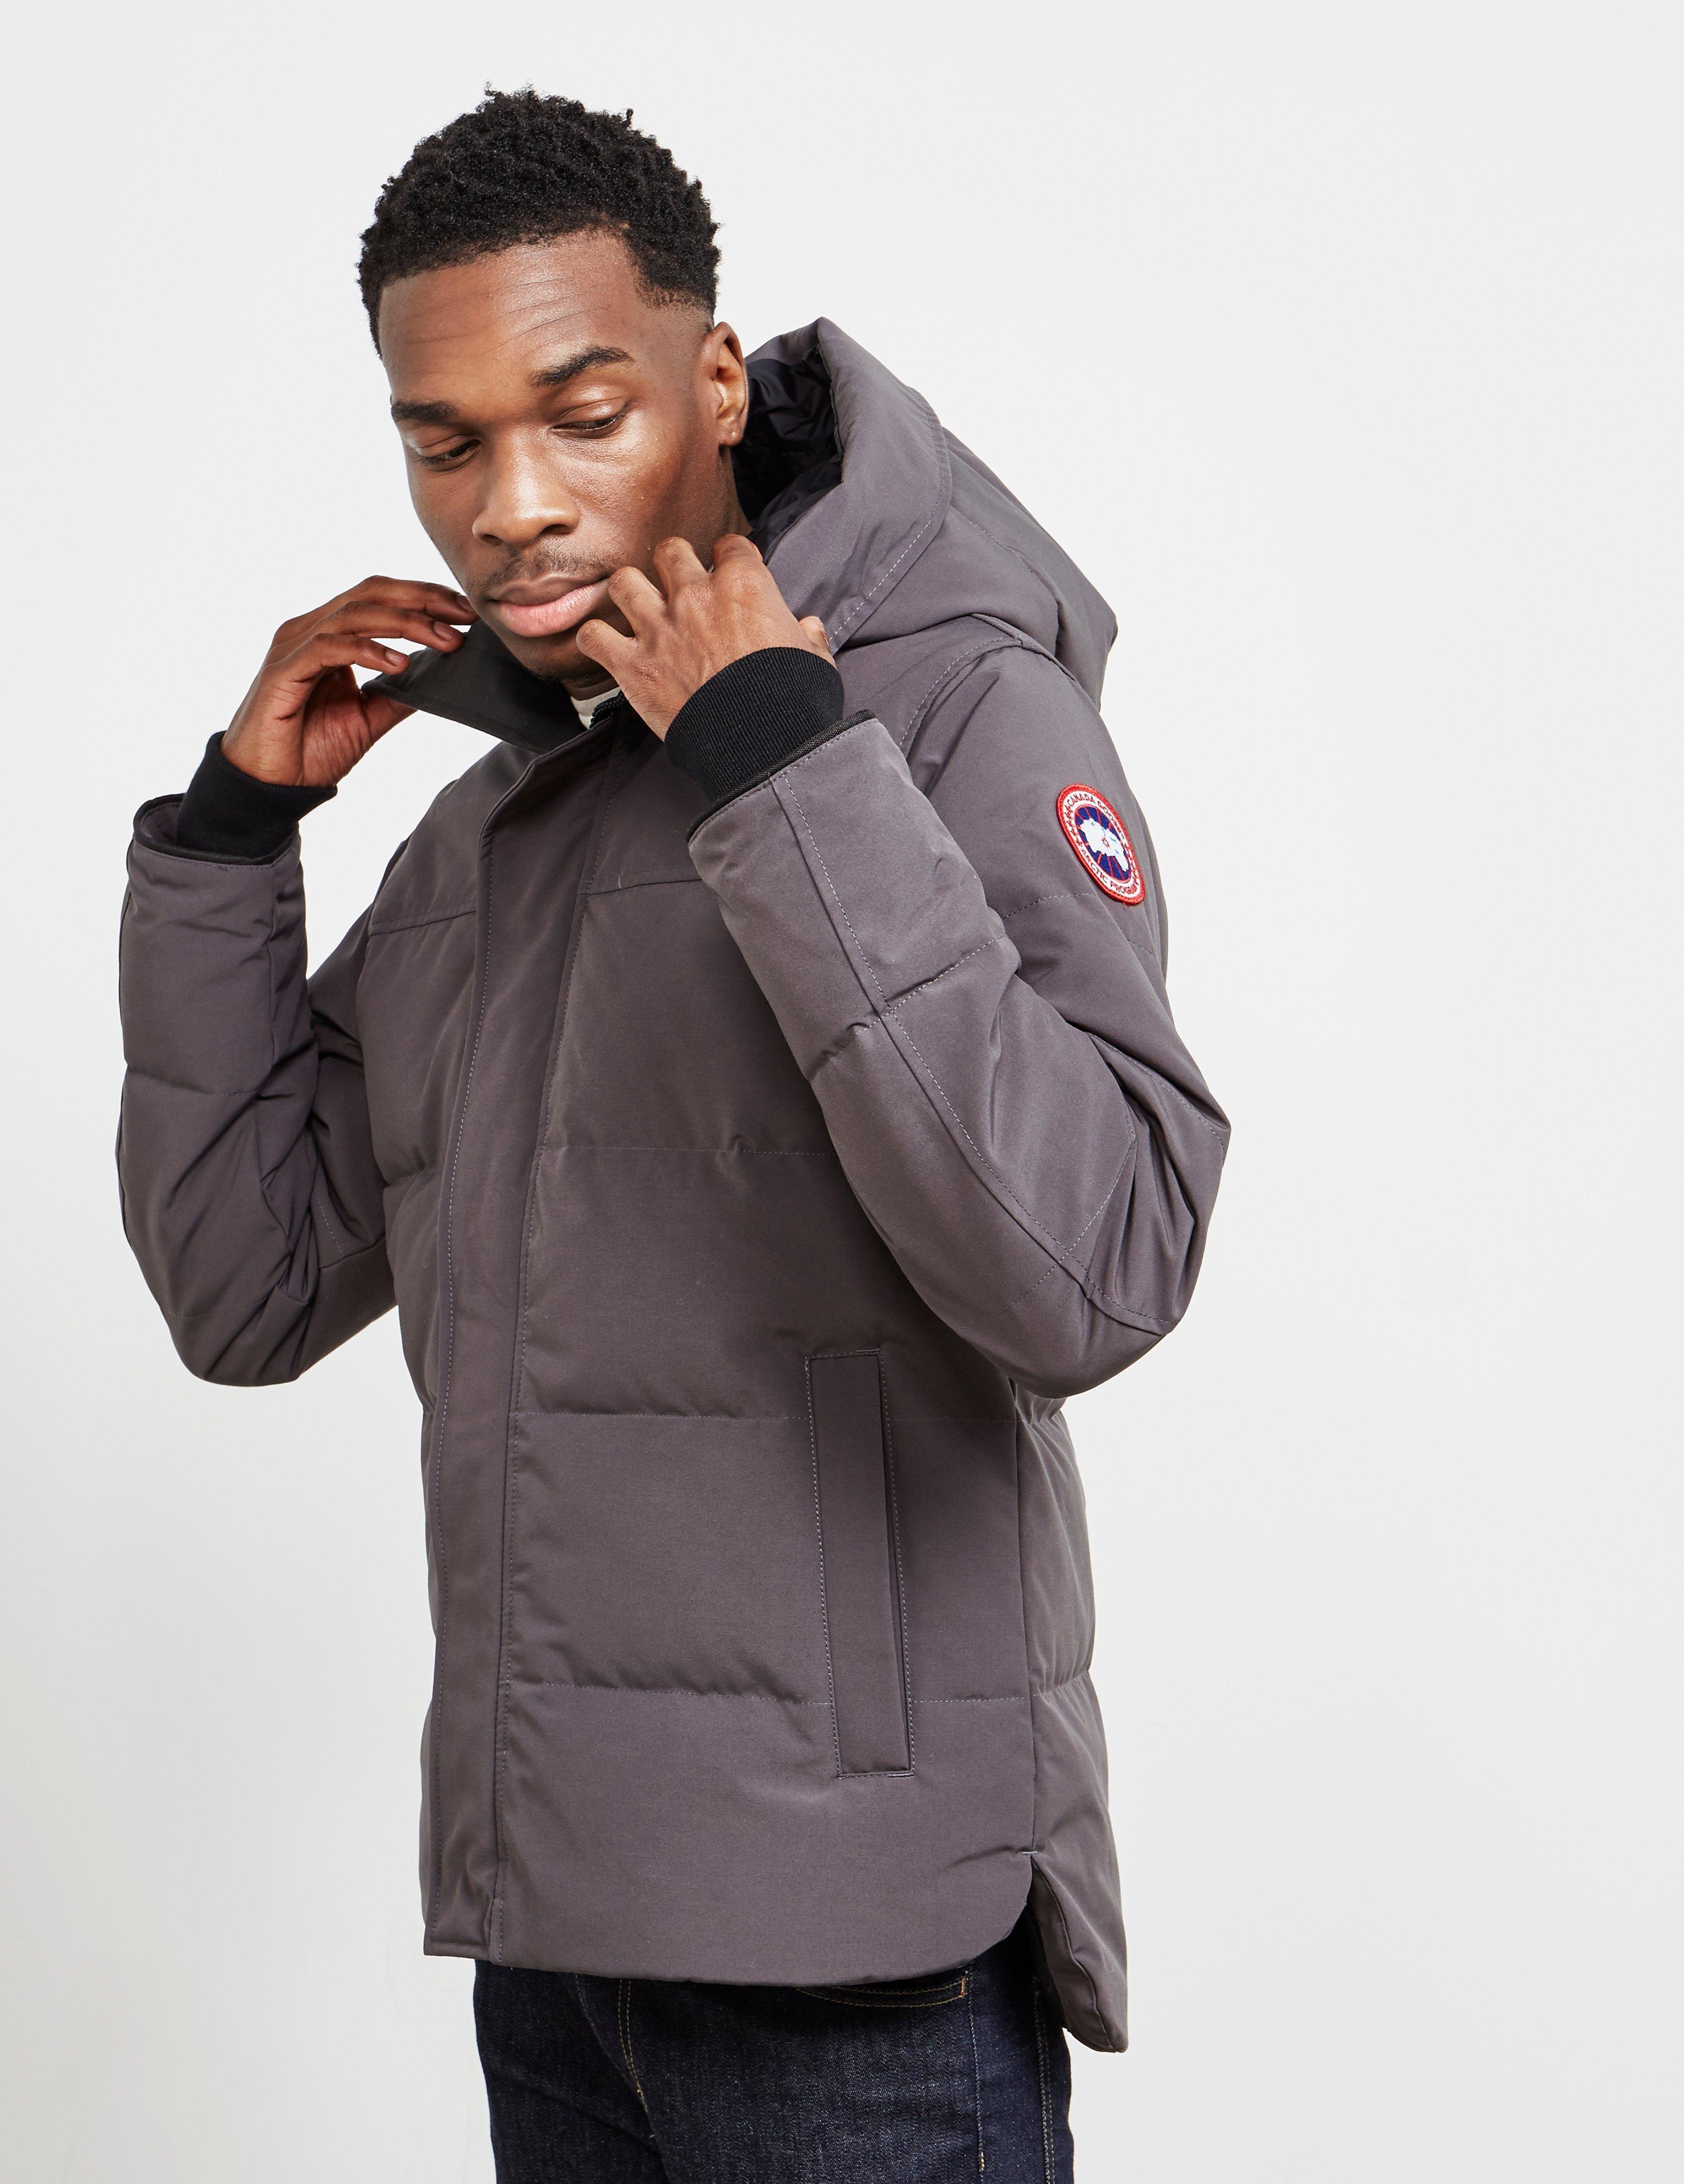 a51b055de8bb Canada Goose Macmillan Padded Parka Jacket Grey in Gray for Men - Lyst